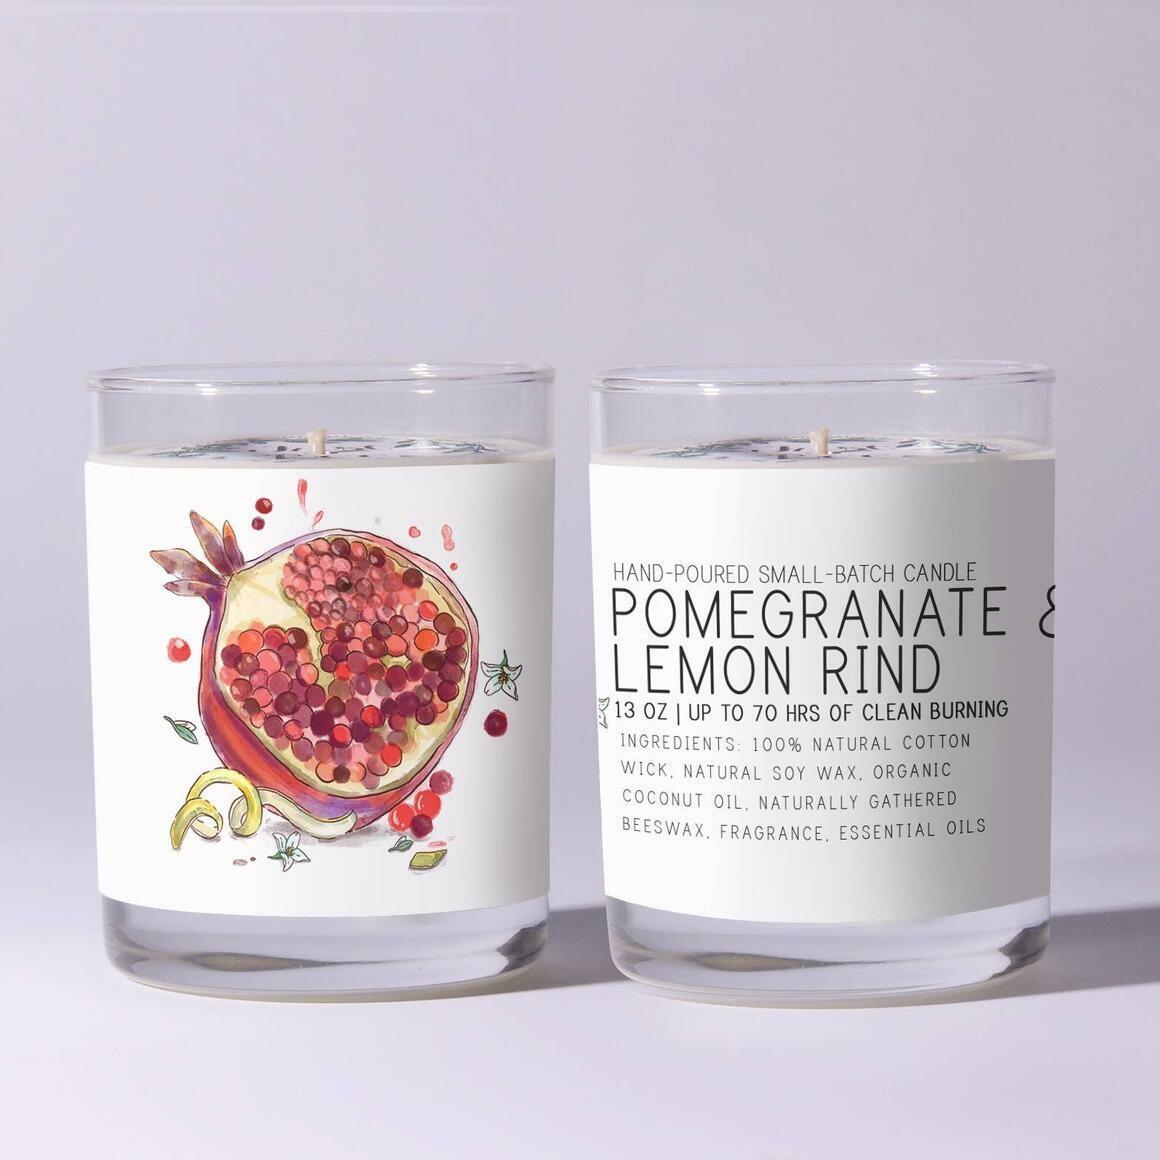 Pomegranate & Lemon Rind - Just Bee Candles | Trada Marketplace